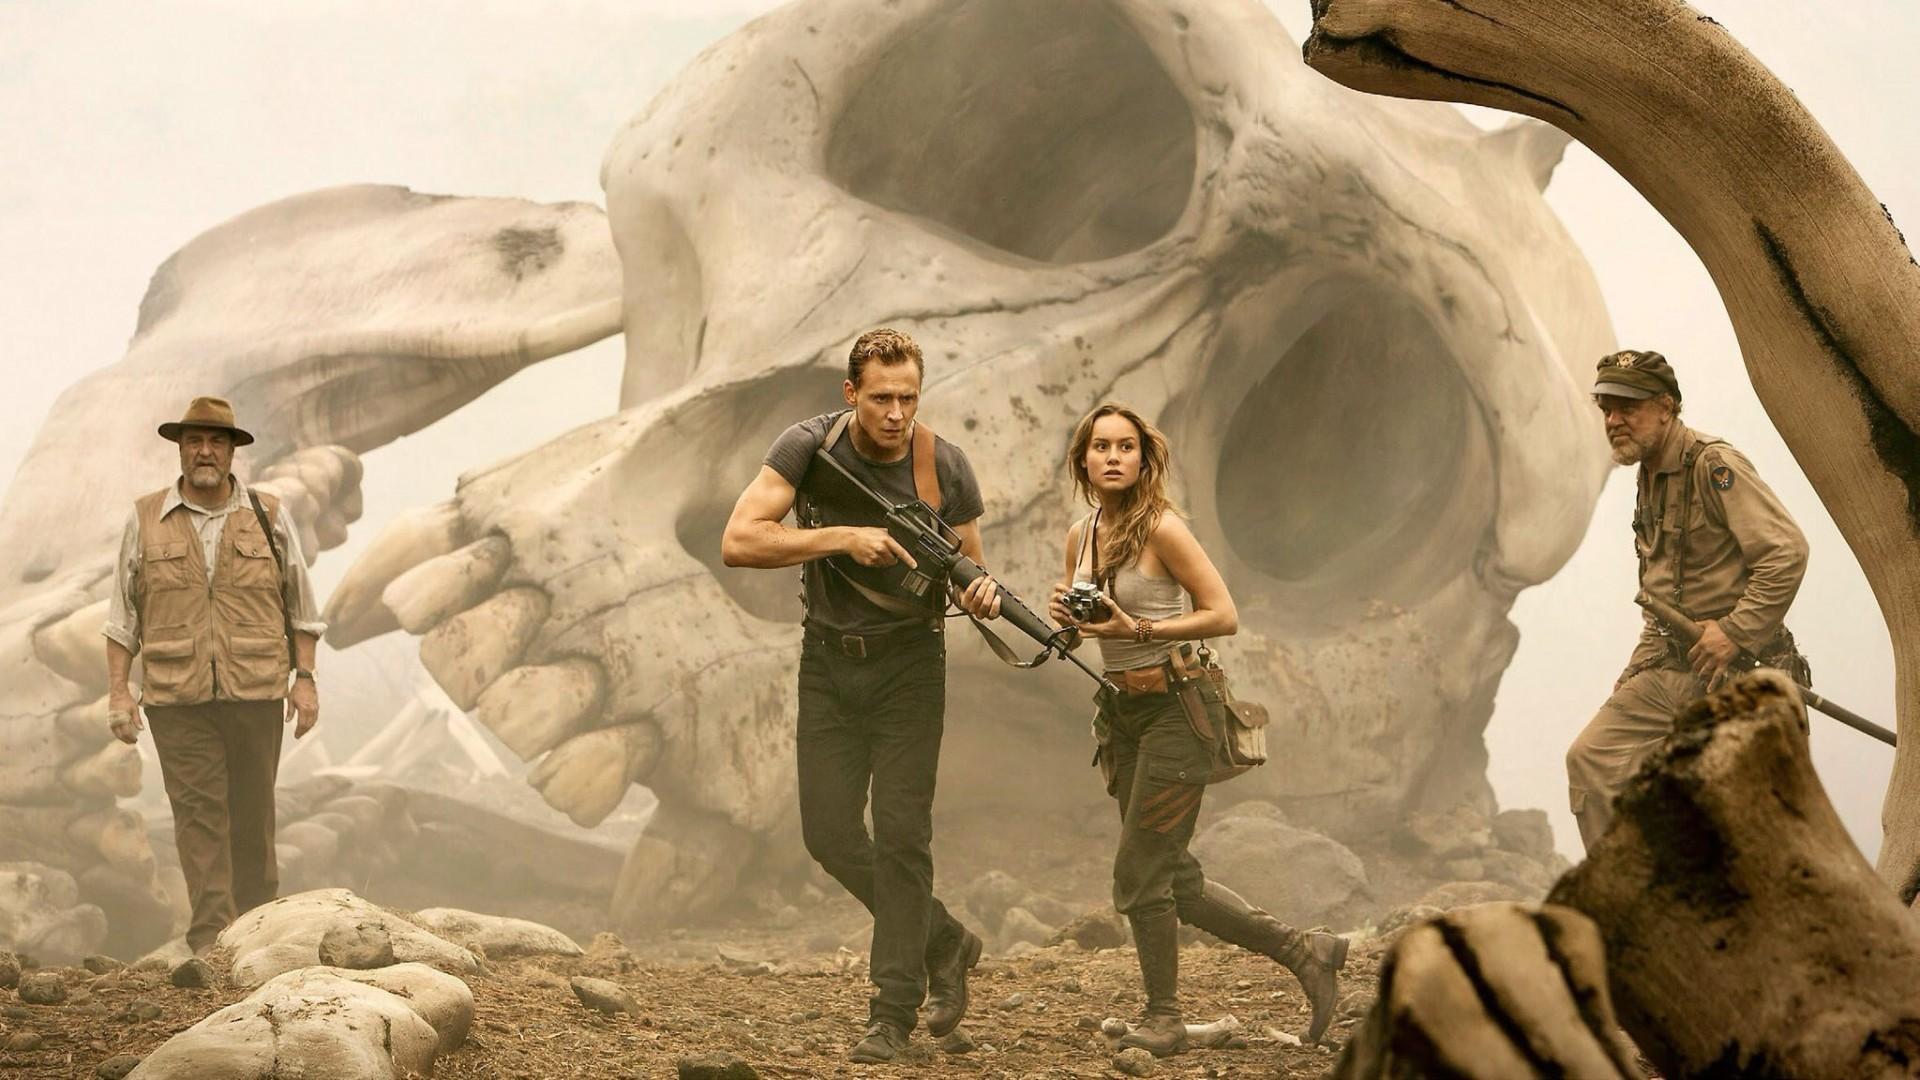 Wallpaper Tom Hiddleston, Brie Larson, Kong: Skull Island, HD, Movies, #3768